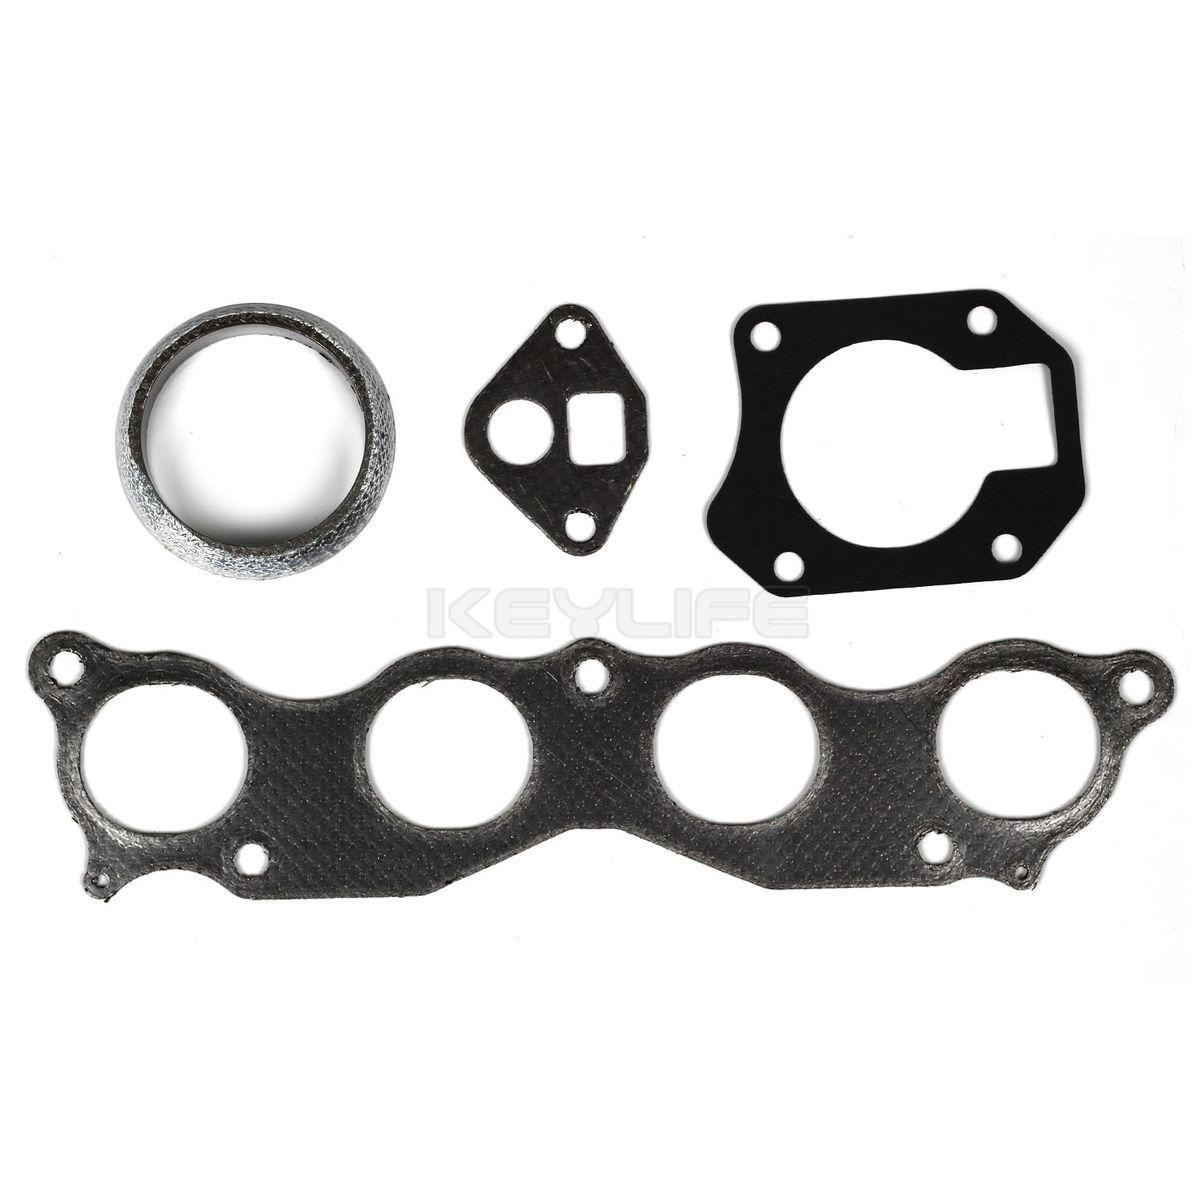 Head Gasket Bolts Kit For Honda Accord Element 03-06 2.4L 2354CC DOHC K24A4